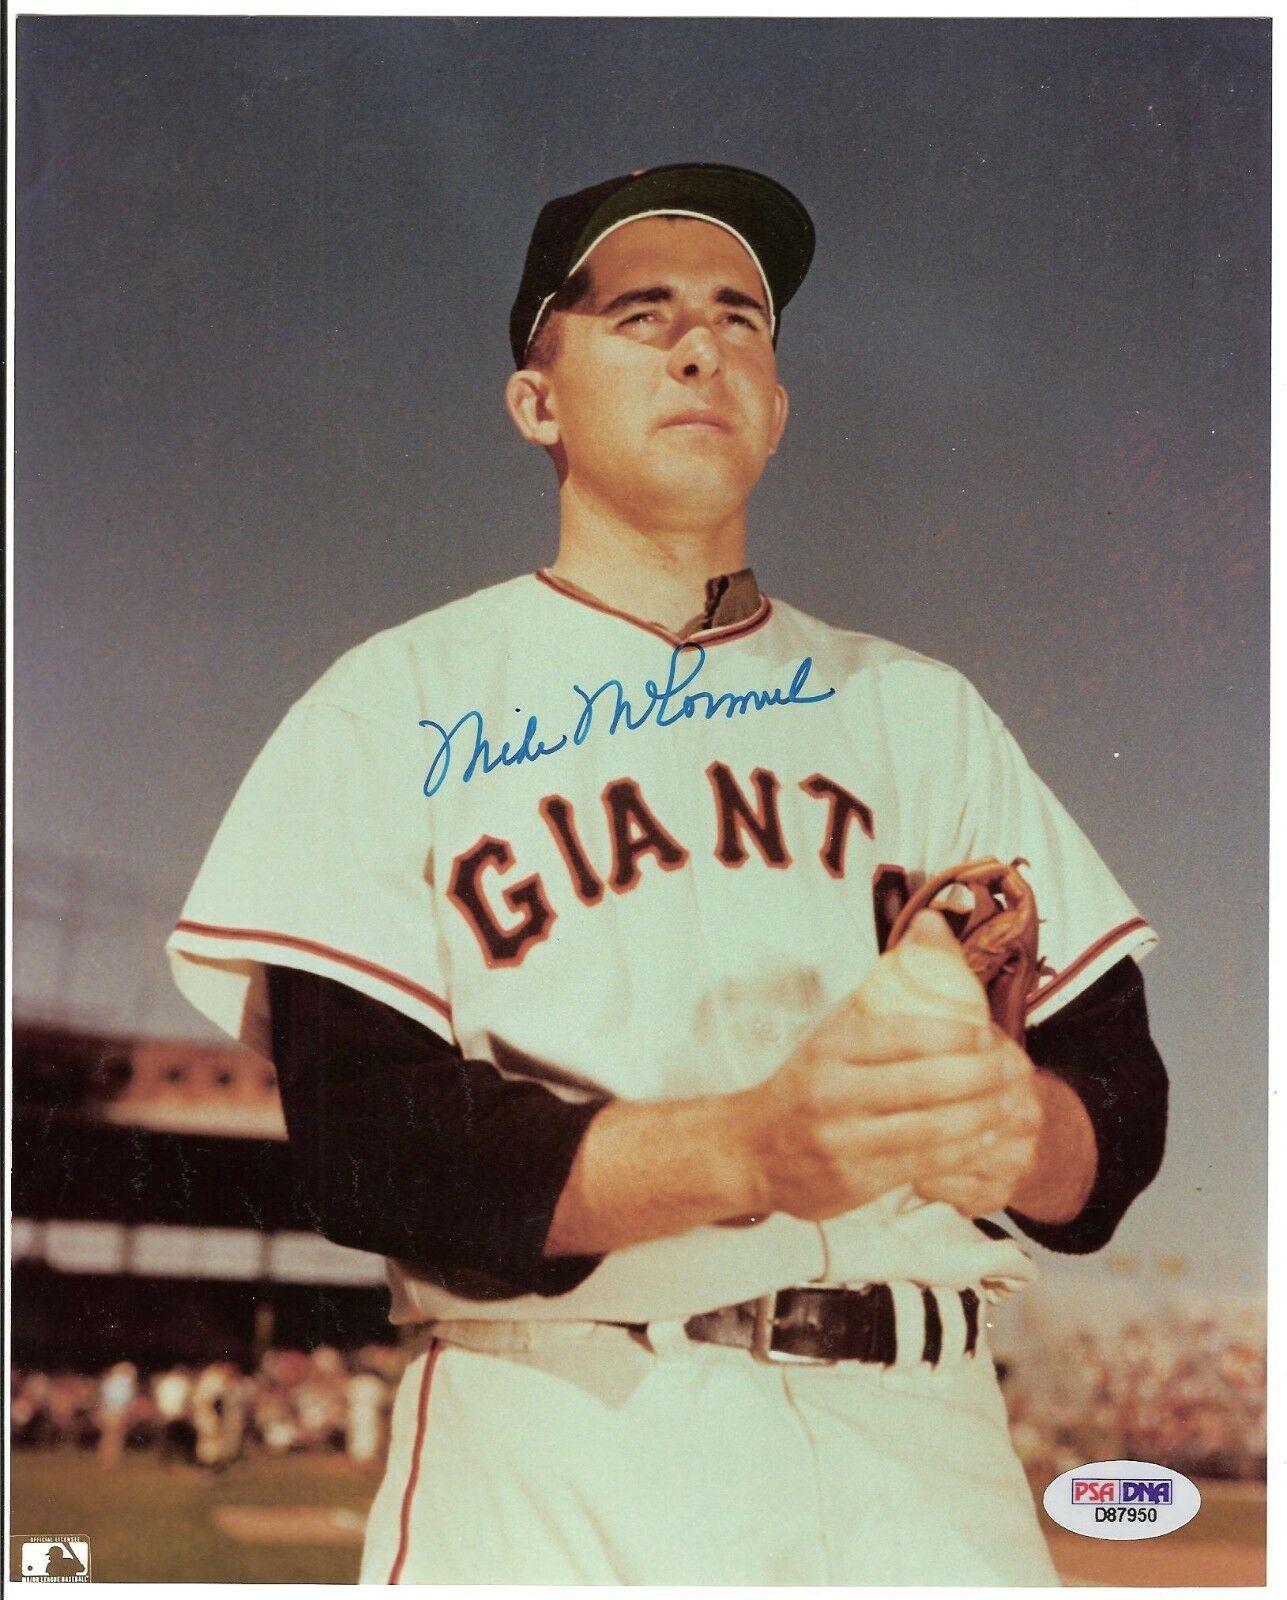 Mike McCormick New York Giants baseball  Signed 8 x 10 Photo PSA bold autograph